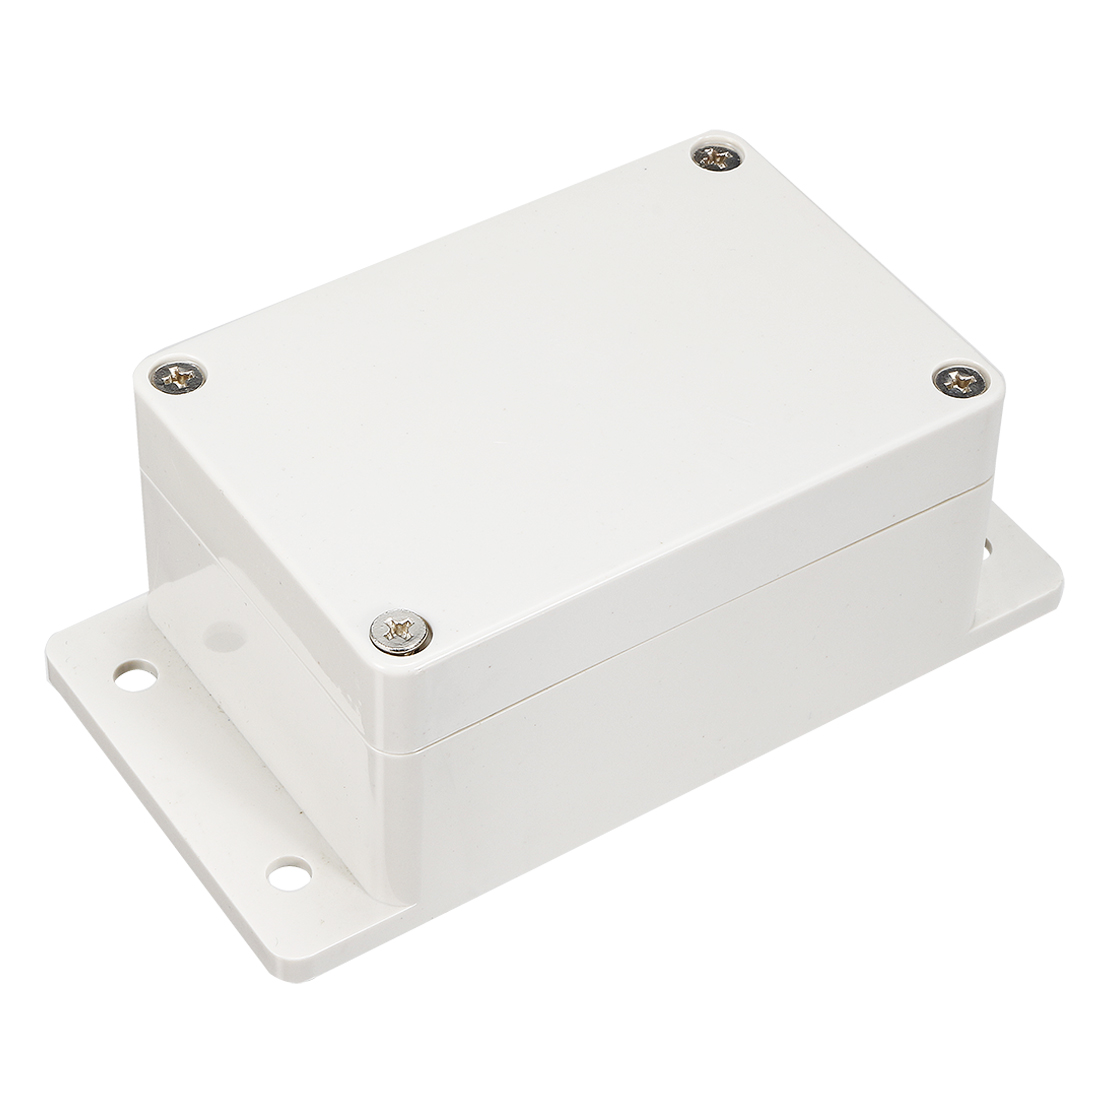 Rectangular Waterproof Plastic DIY Junction Box Case 98 x 67 x 50mm